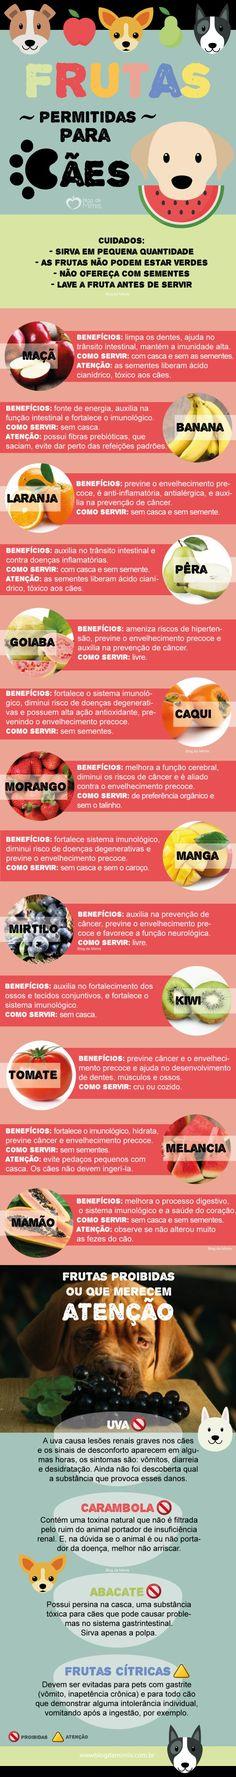 Frutas permitidas/proibidas para cães